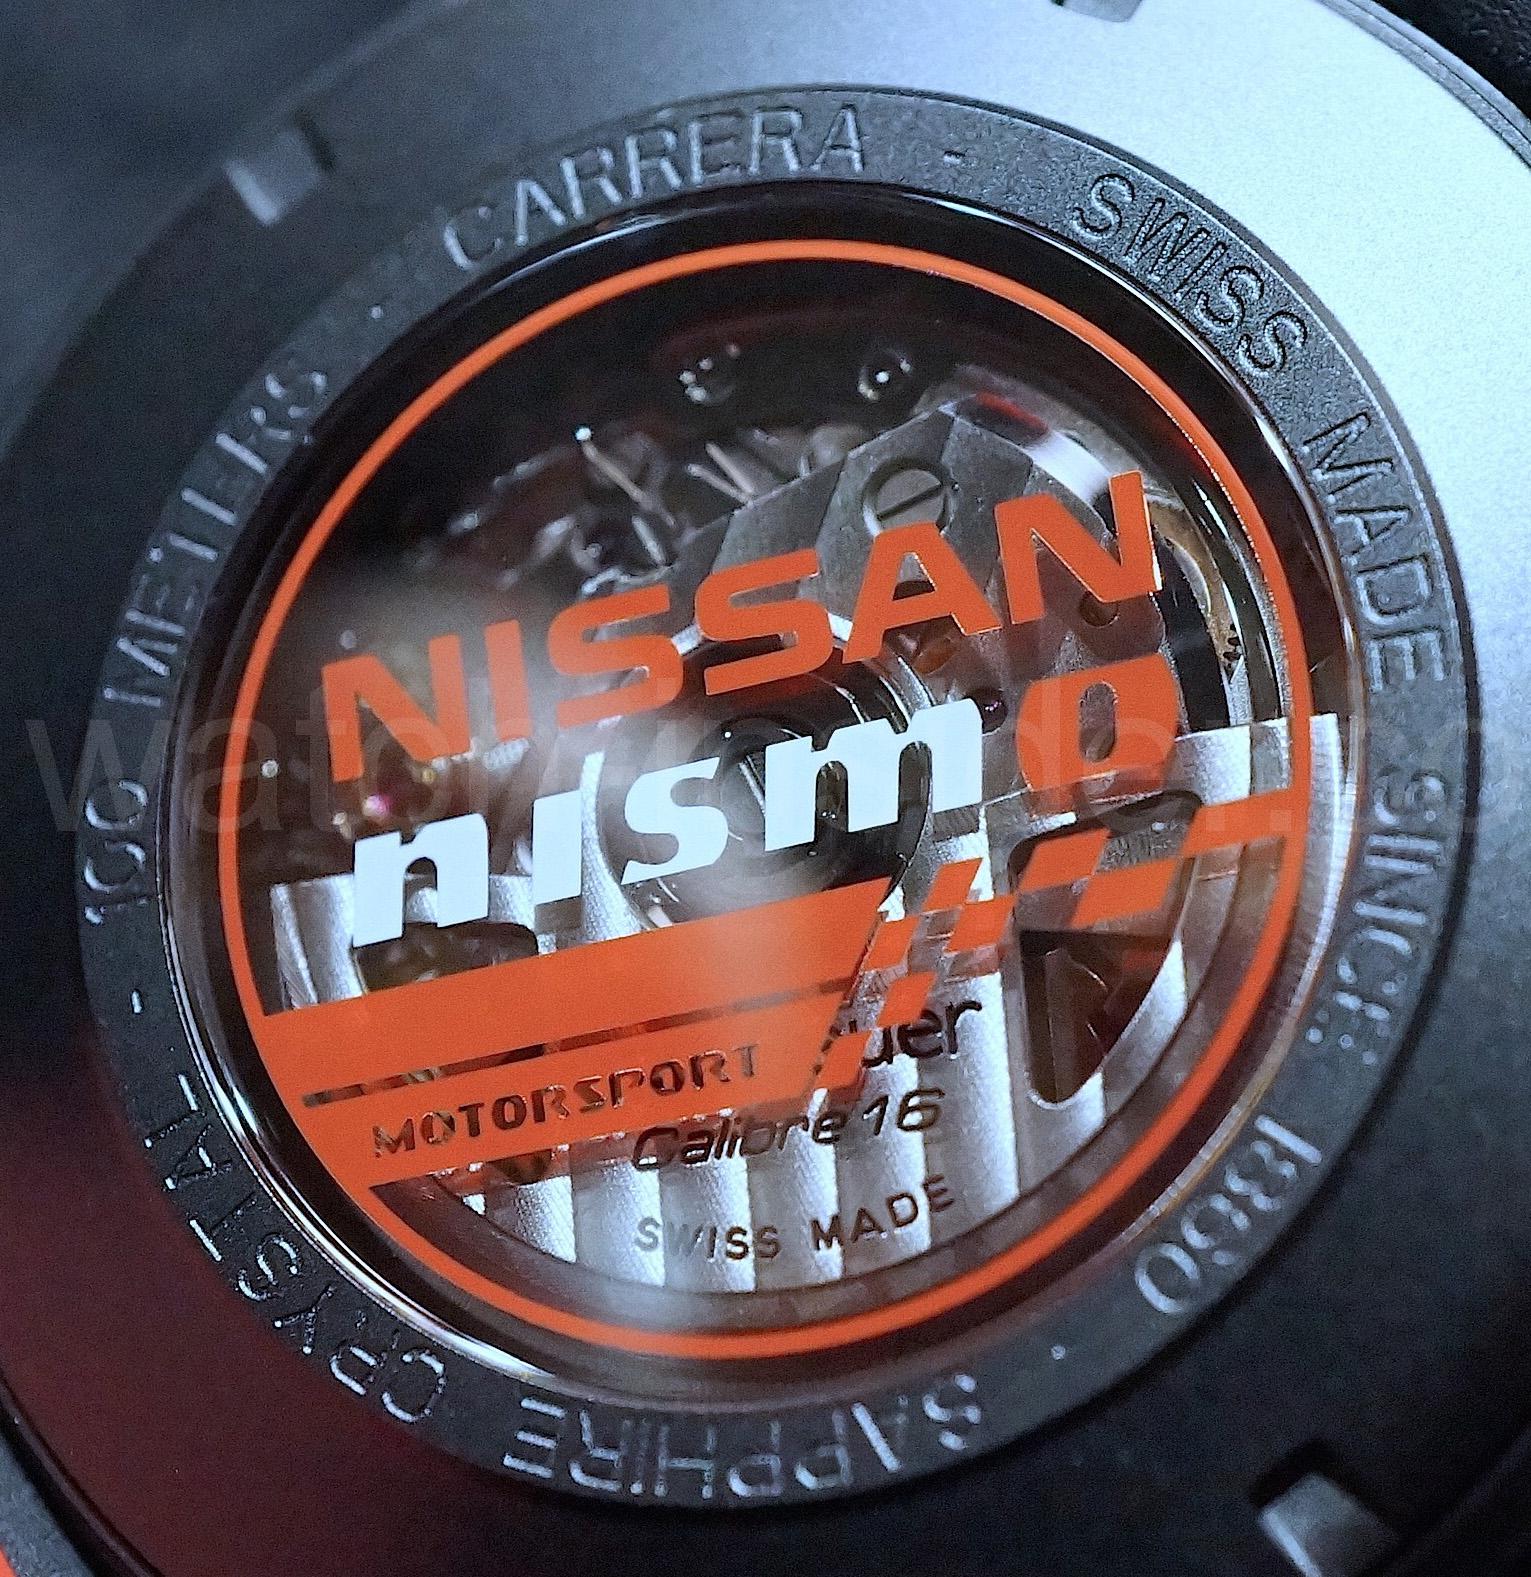 TAG Heuer Carrera Special Edition Nissan Nismo